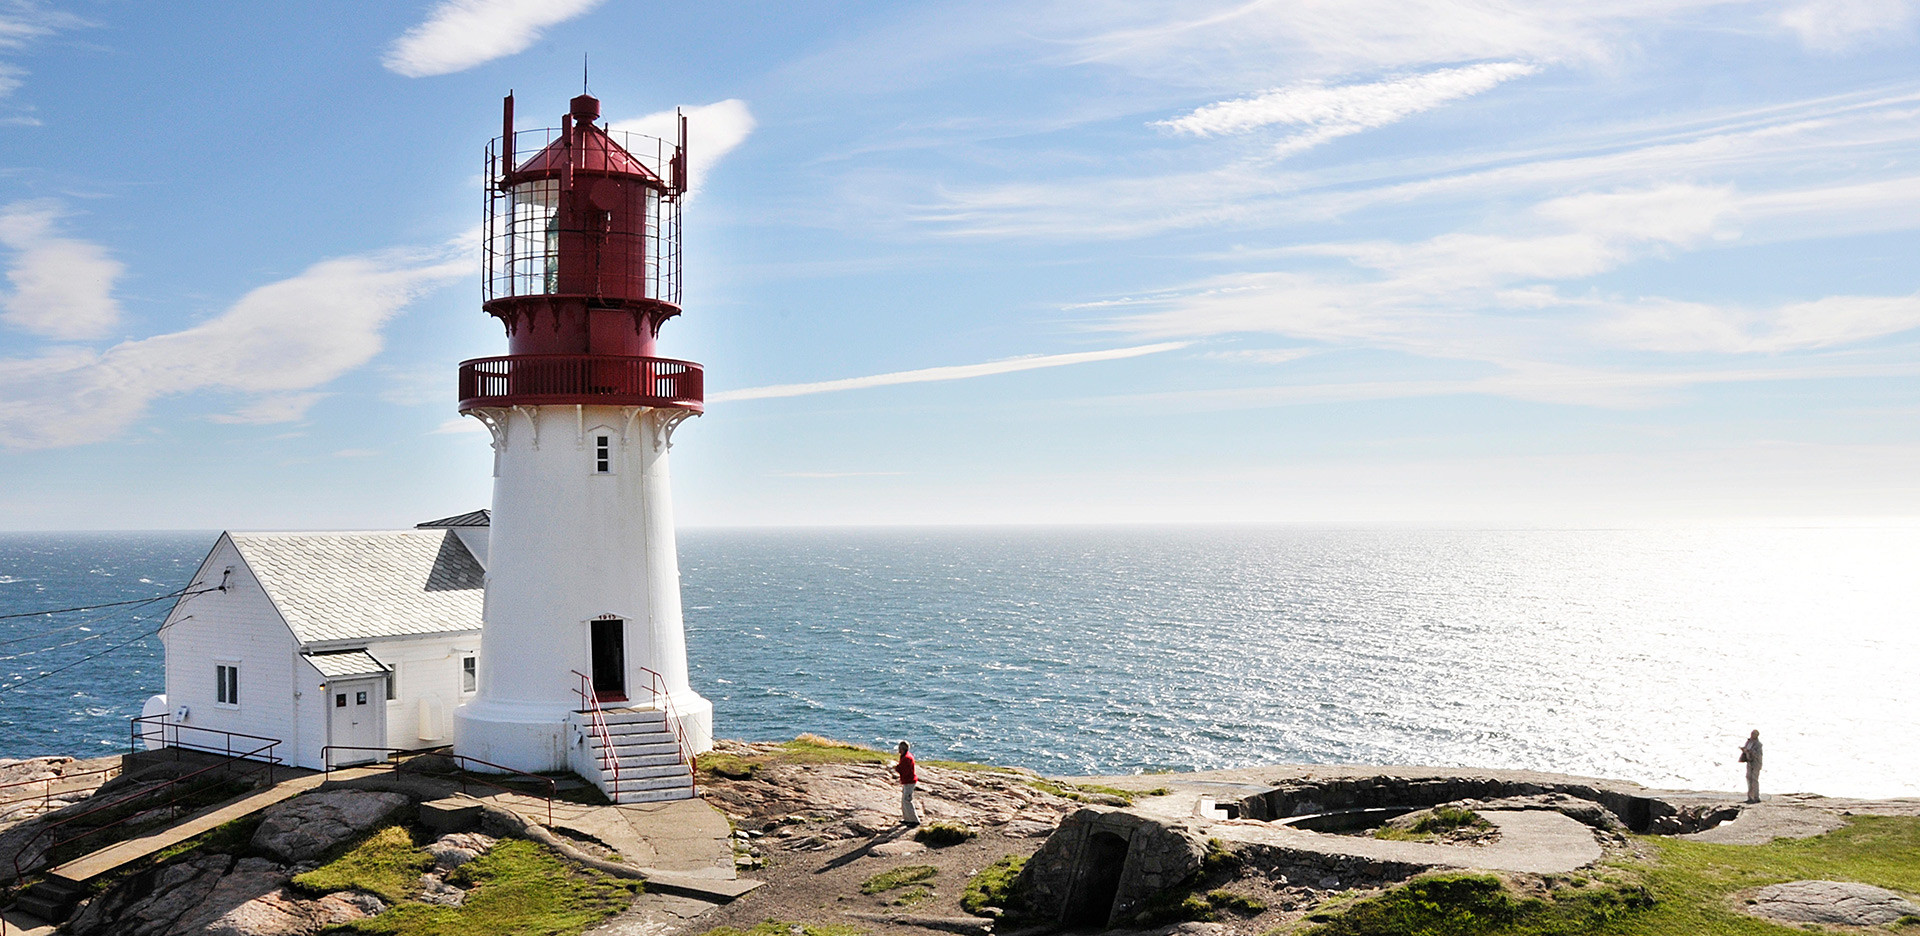 Маяк Линдеснес – старейший маяк Норвегии